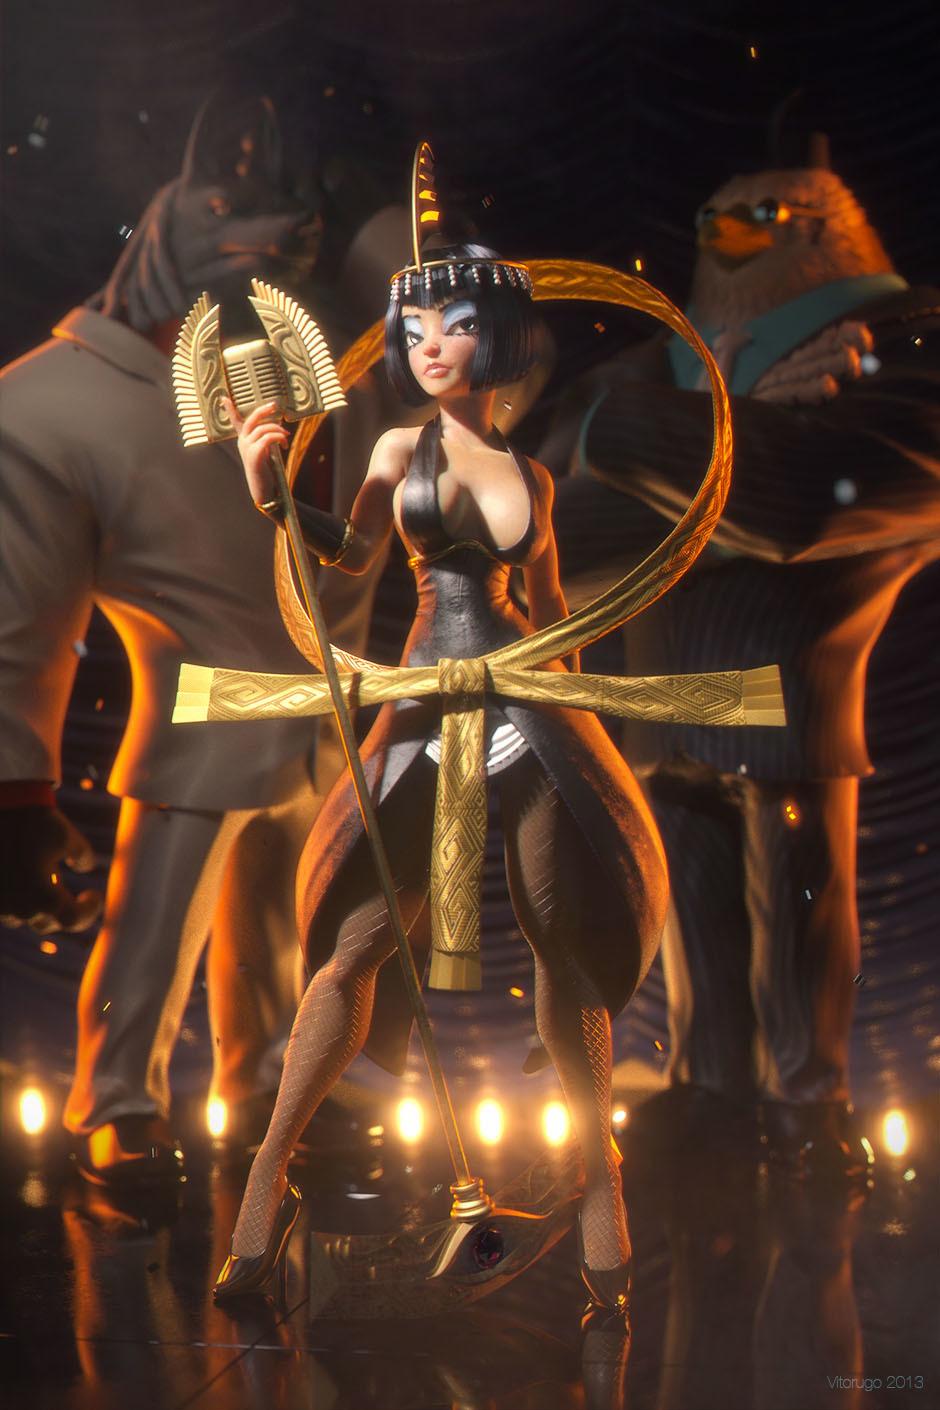 Vitorugo eliza the goddess di 1 50c0795f 6iog